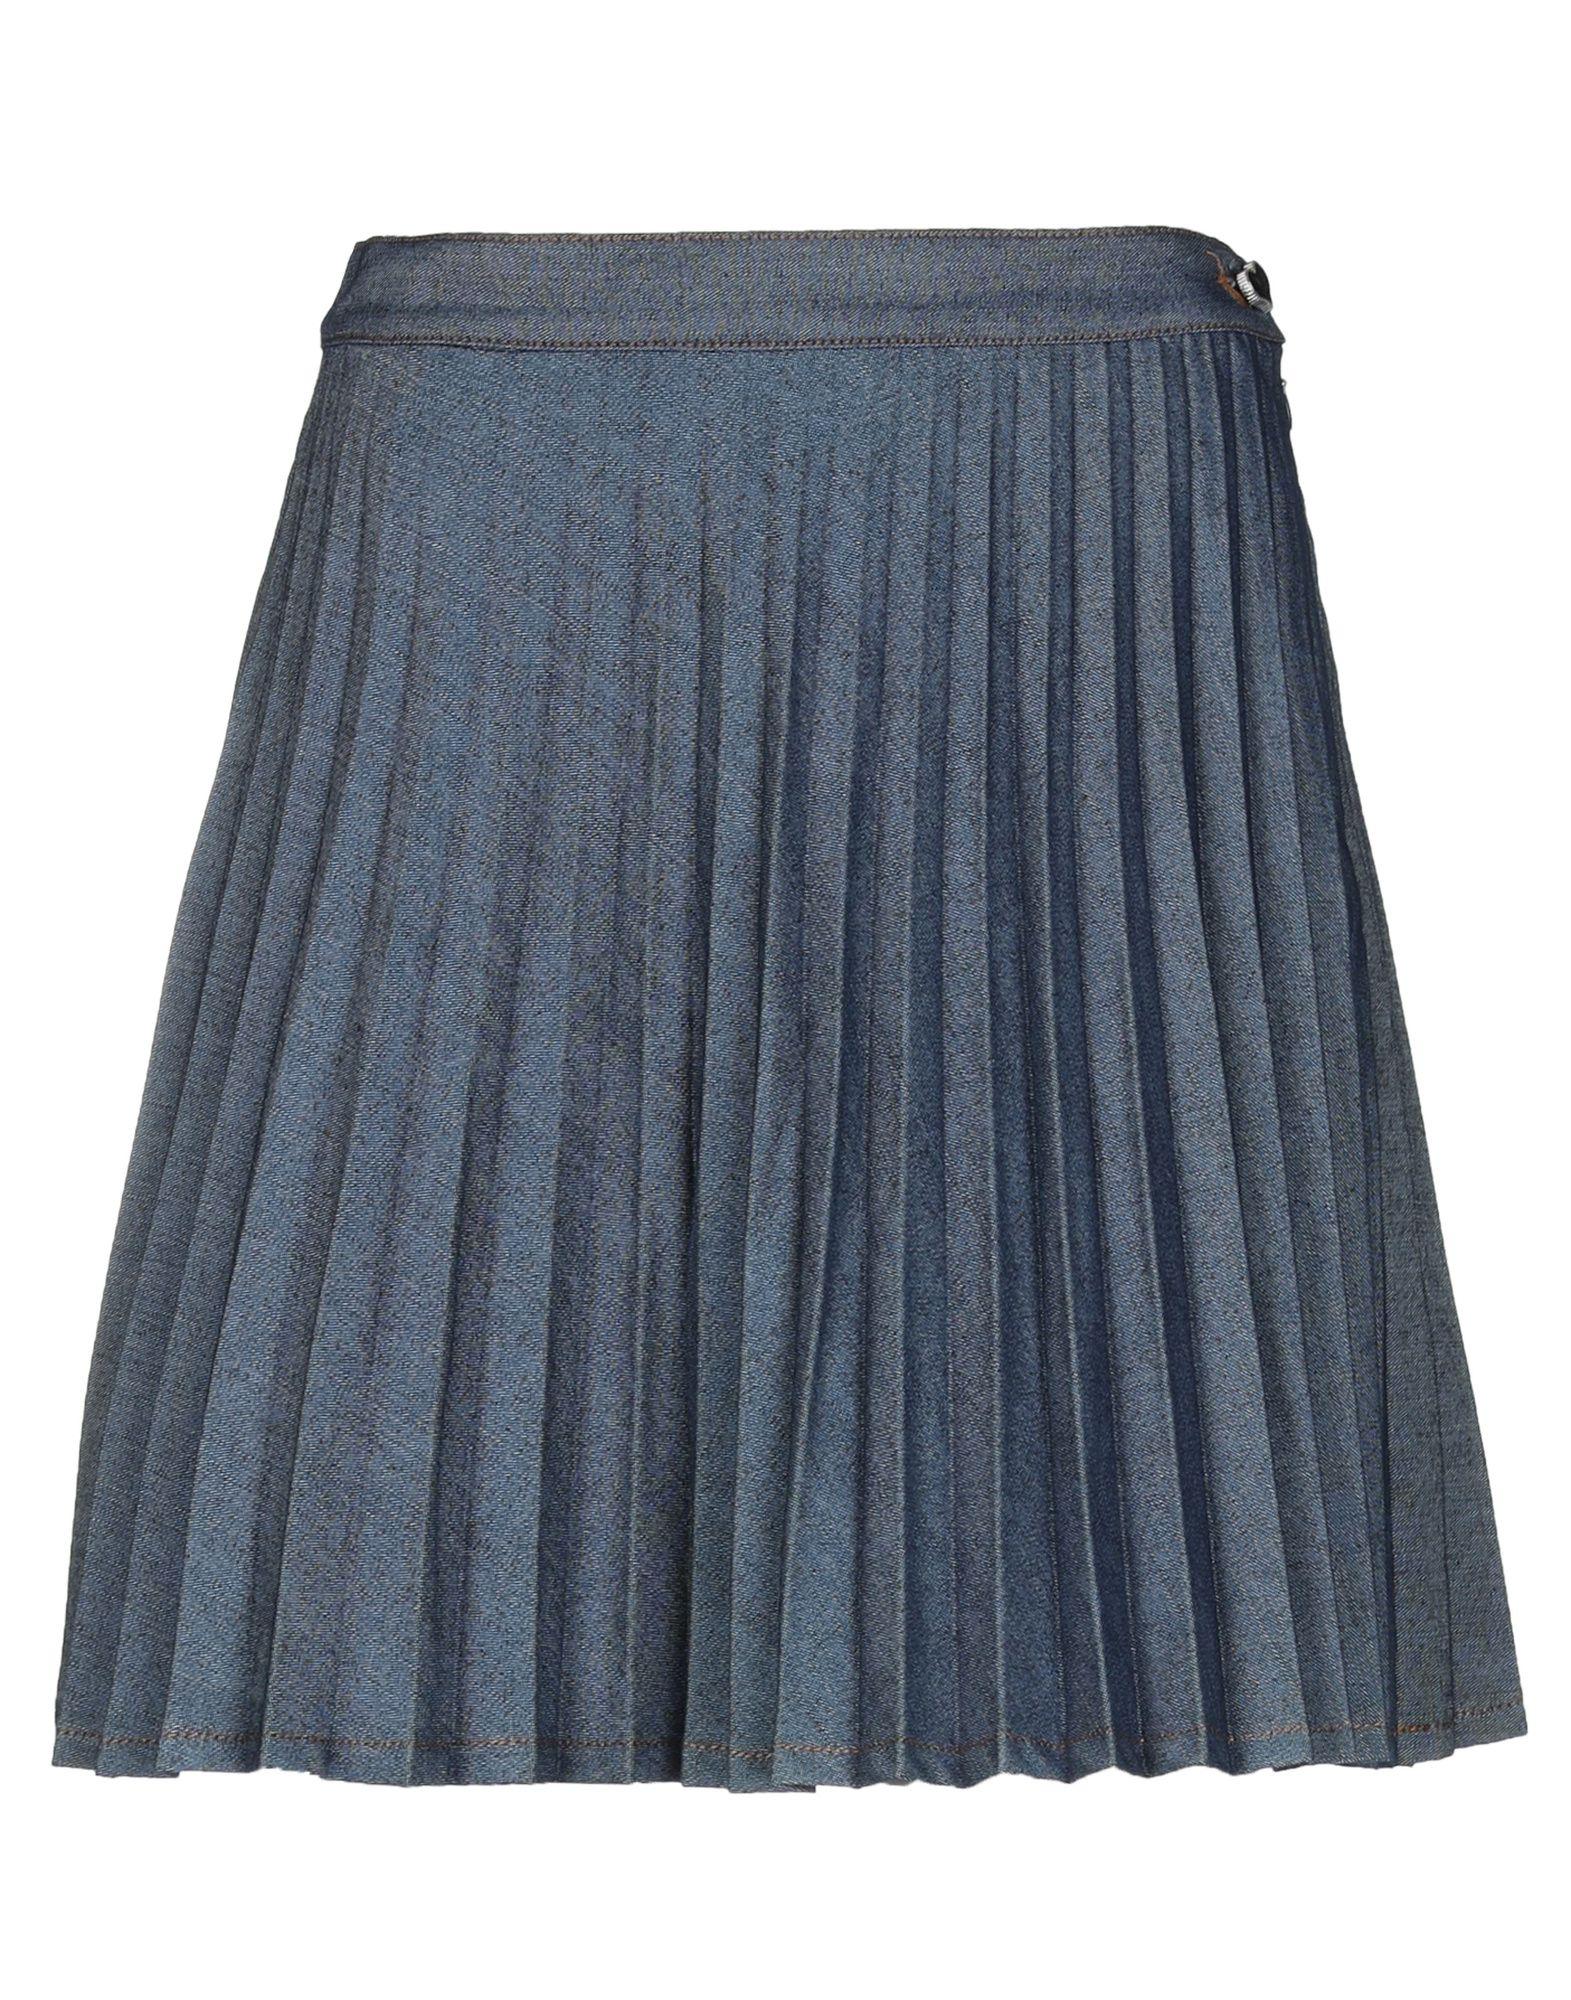 MY TWIN TWINSET Джинсовая юбка my twin twinset юбка до колена